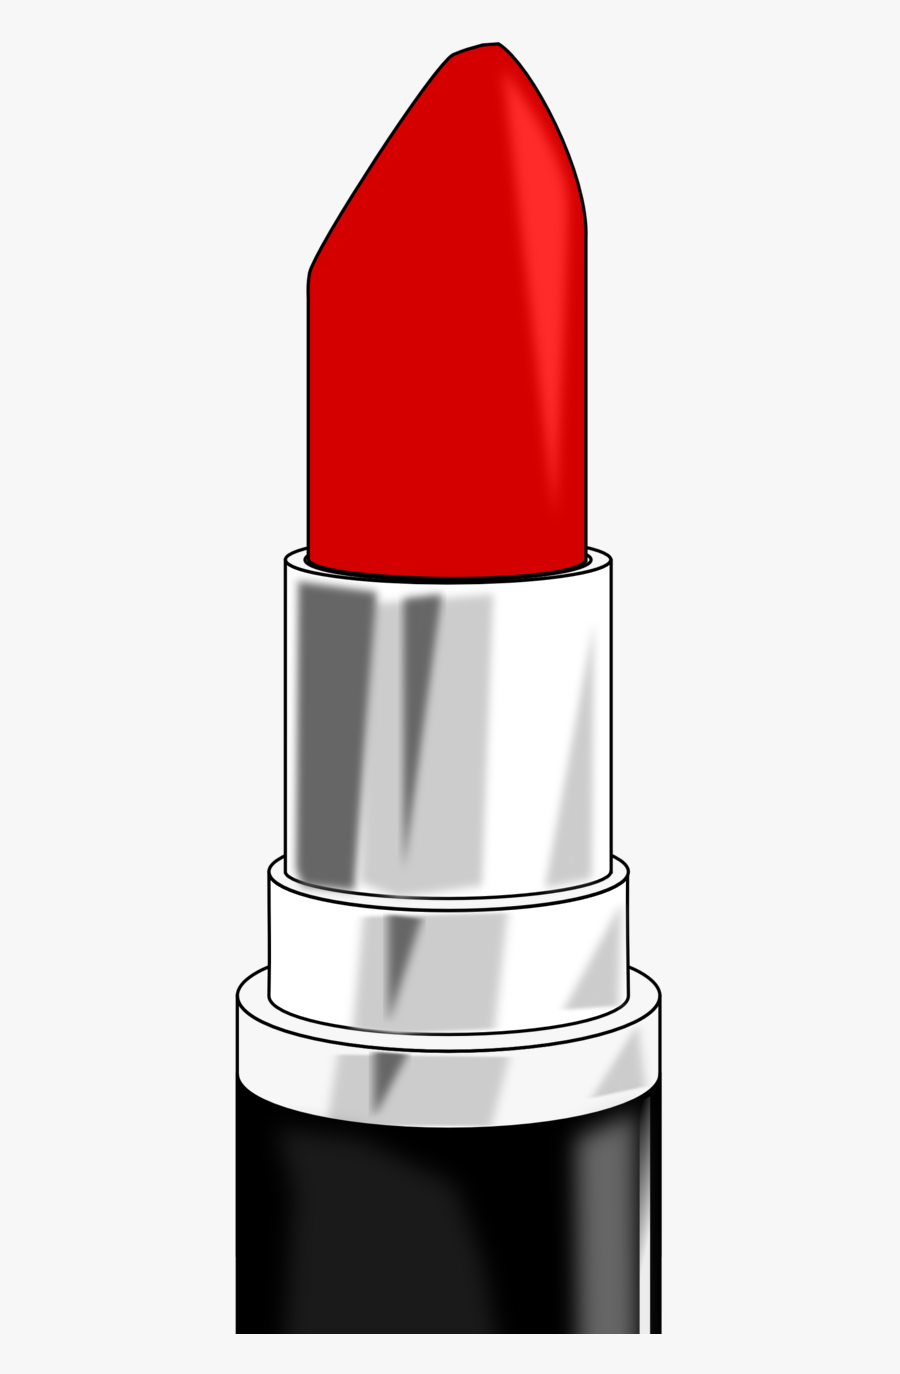 Lipstick - Red Lipstick Clipart, Transparent Clipart